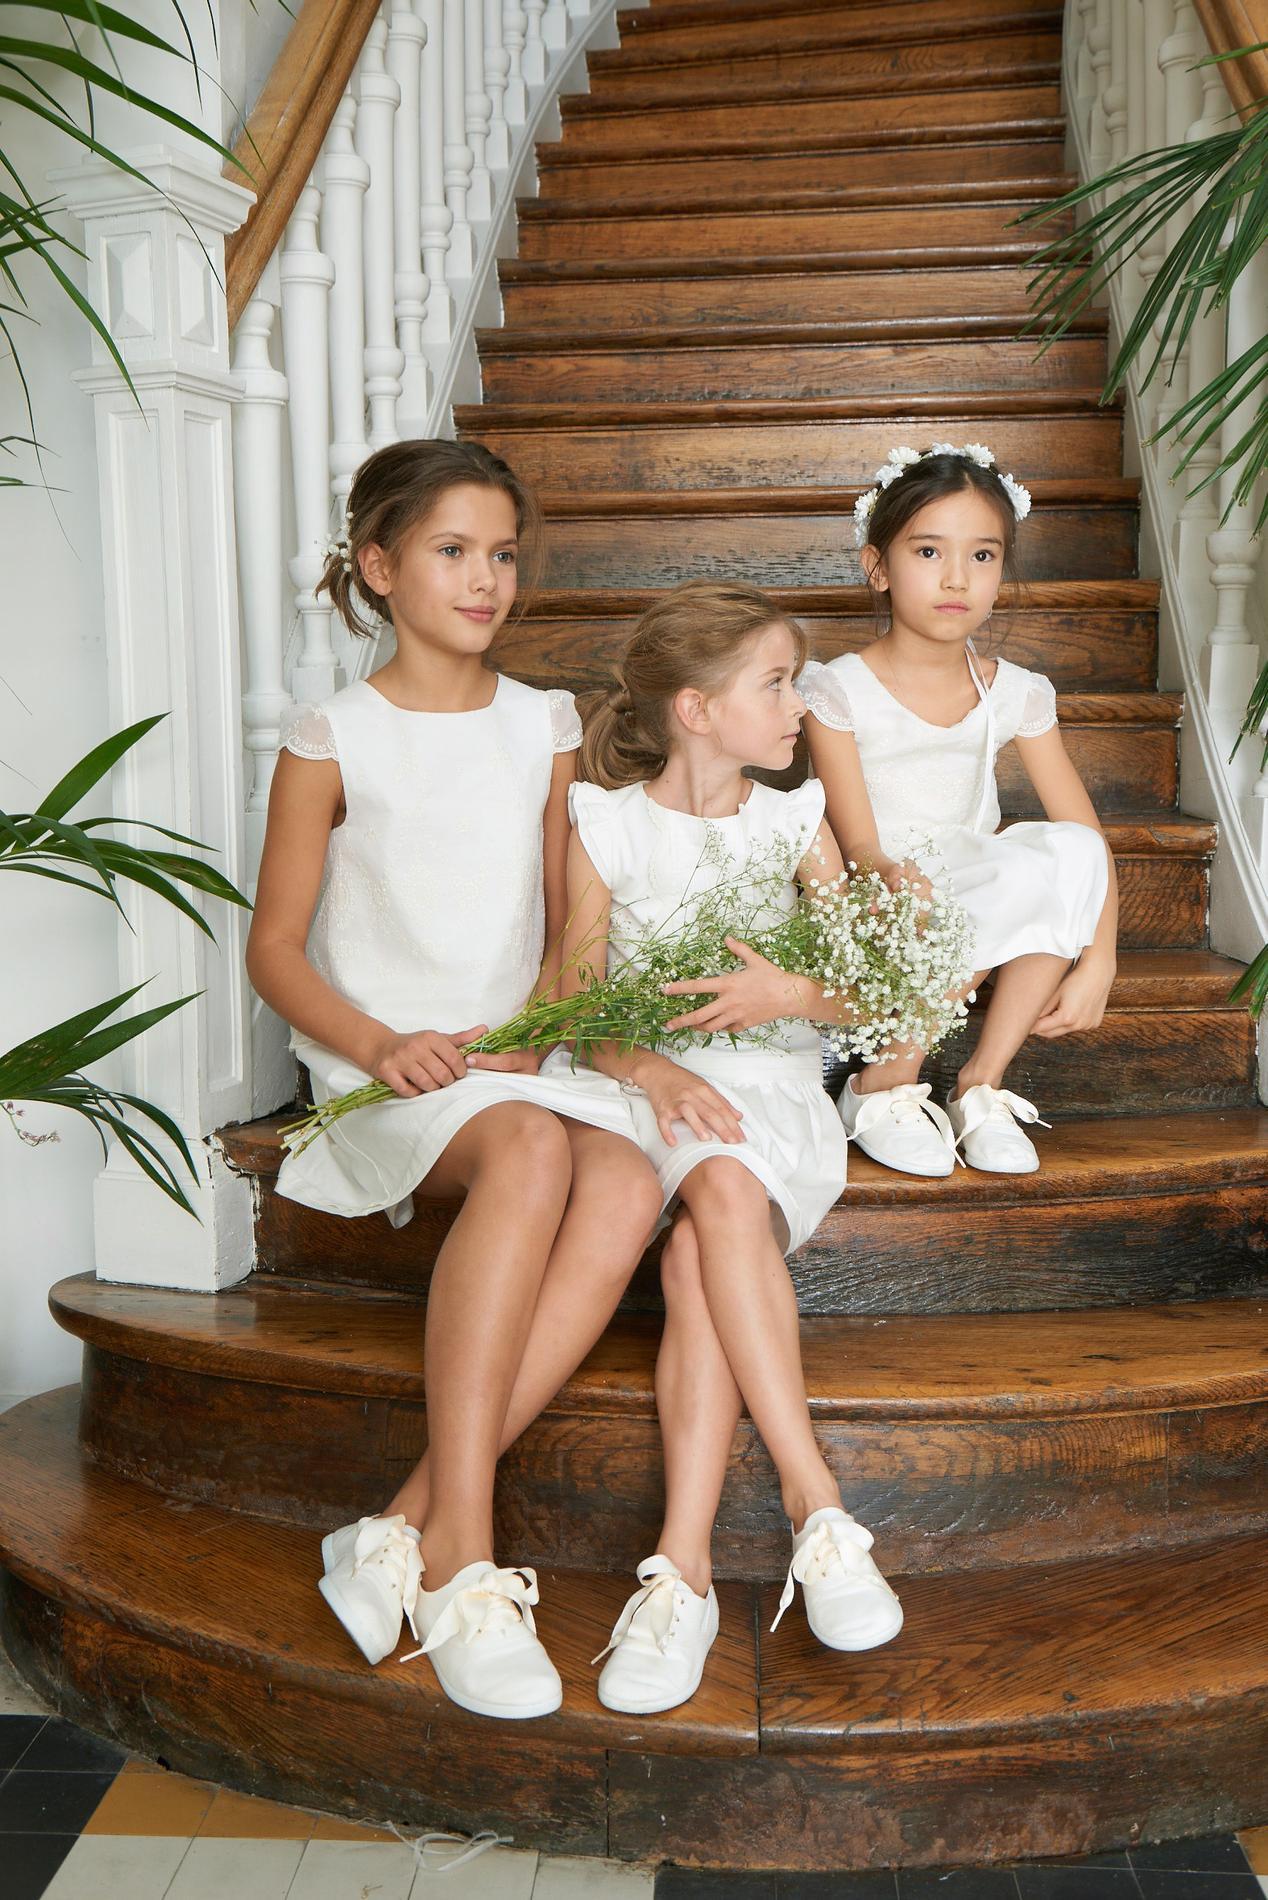 9e72d27f7cbe5 ... idées de tenues enfants pour un joli cortège - Cyrillus Mariage   nos  idées de tenues enfants pour un joli cortège - Ovale Mariage   nos idées de  tenues ...